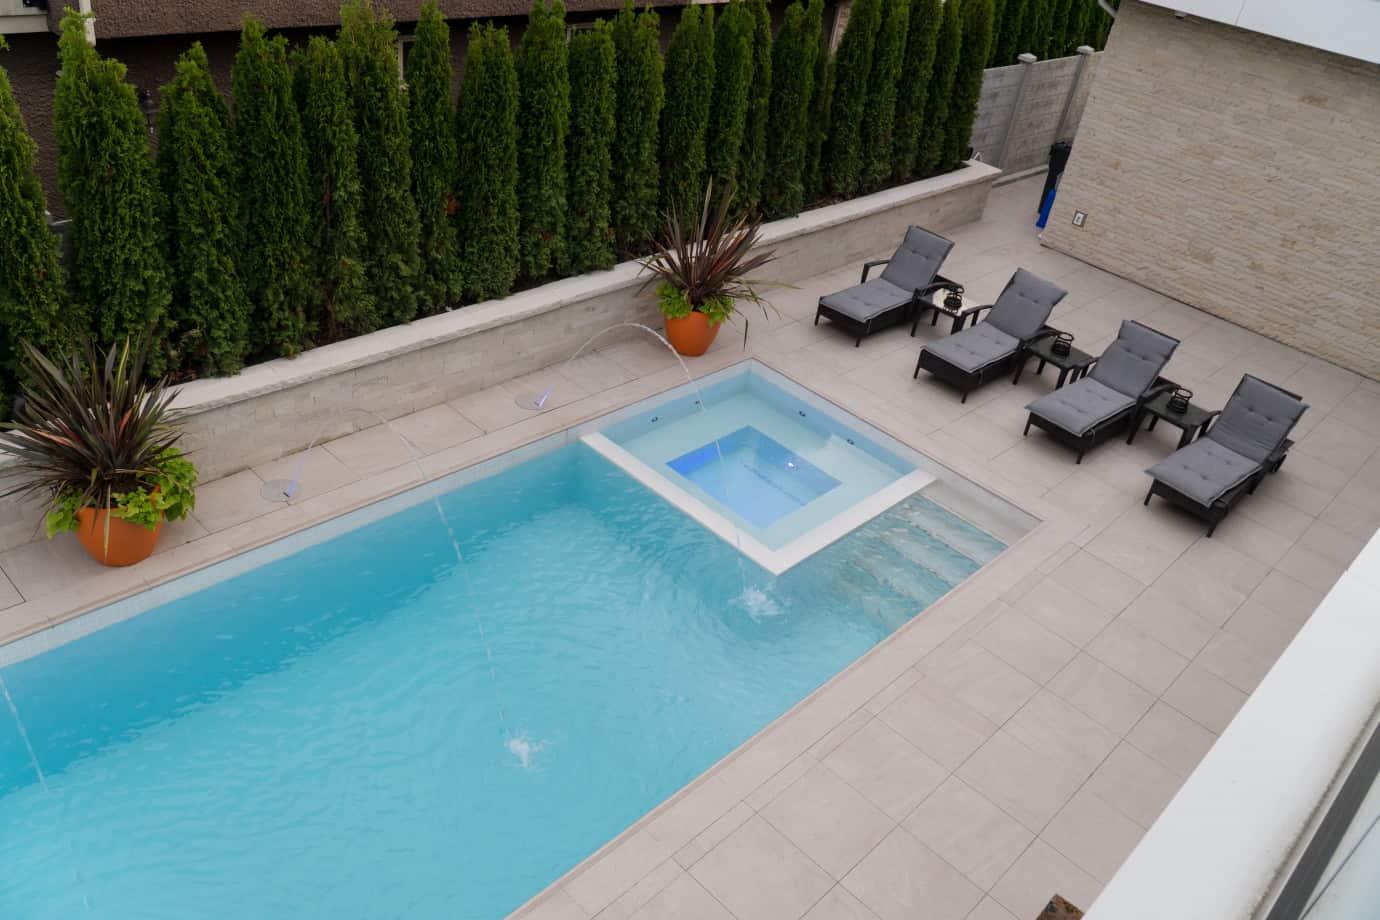 custom-swimming-pool-azuro-Nic23